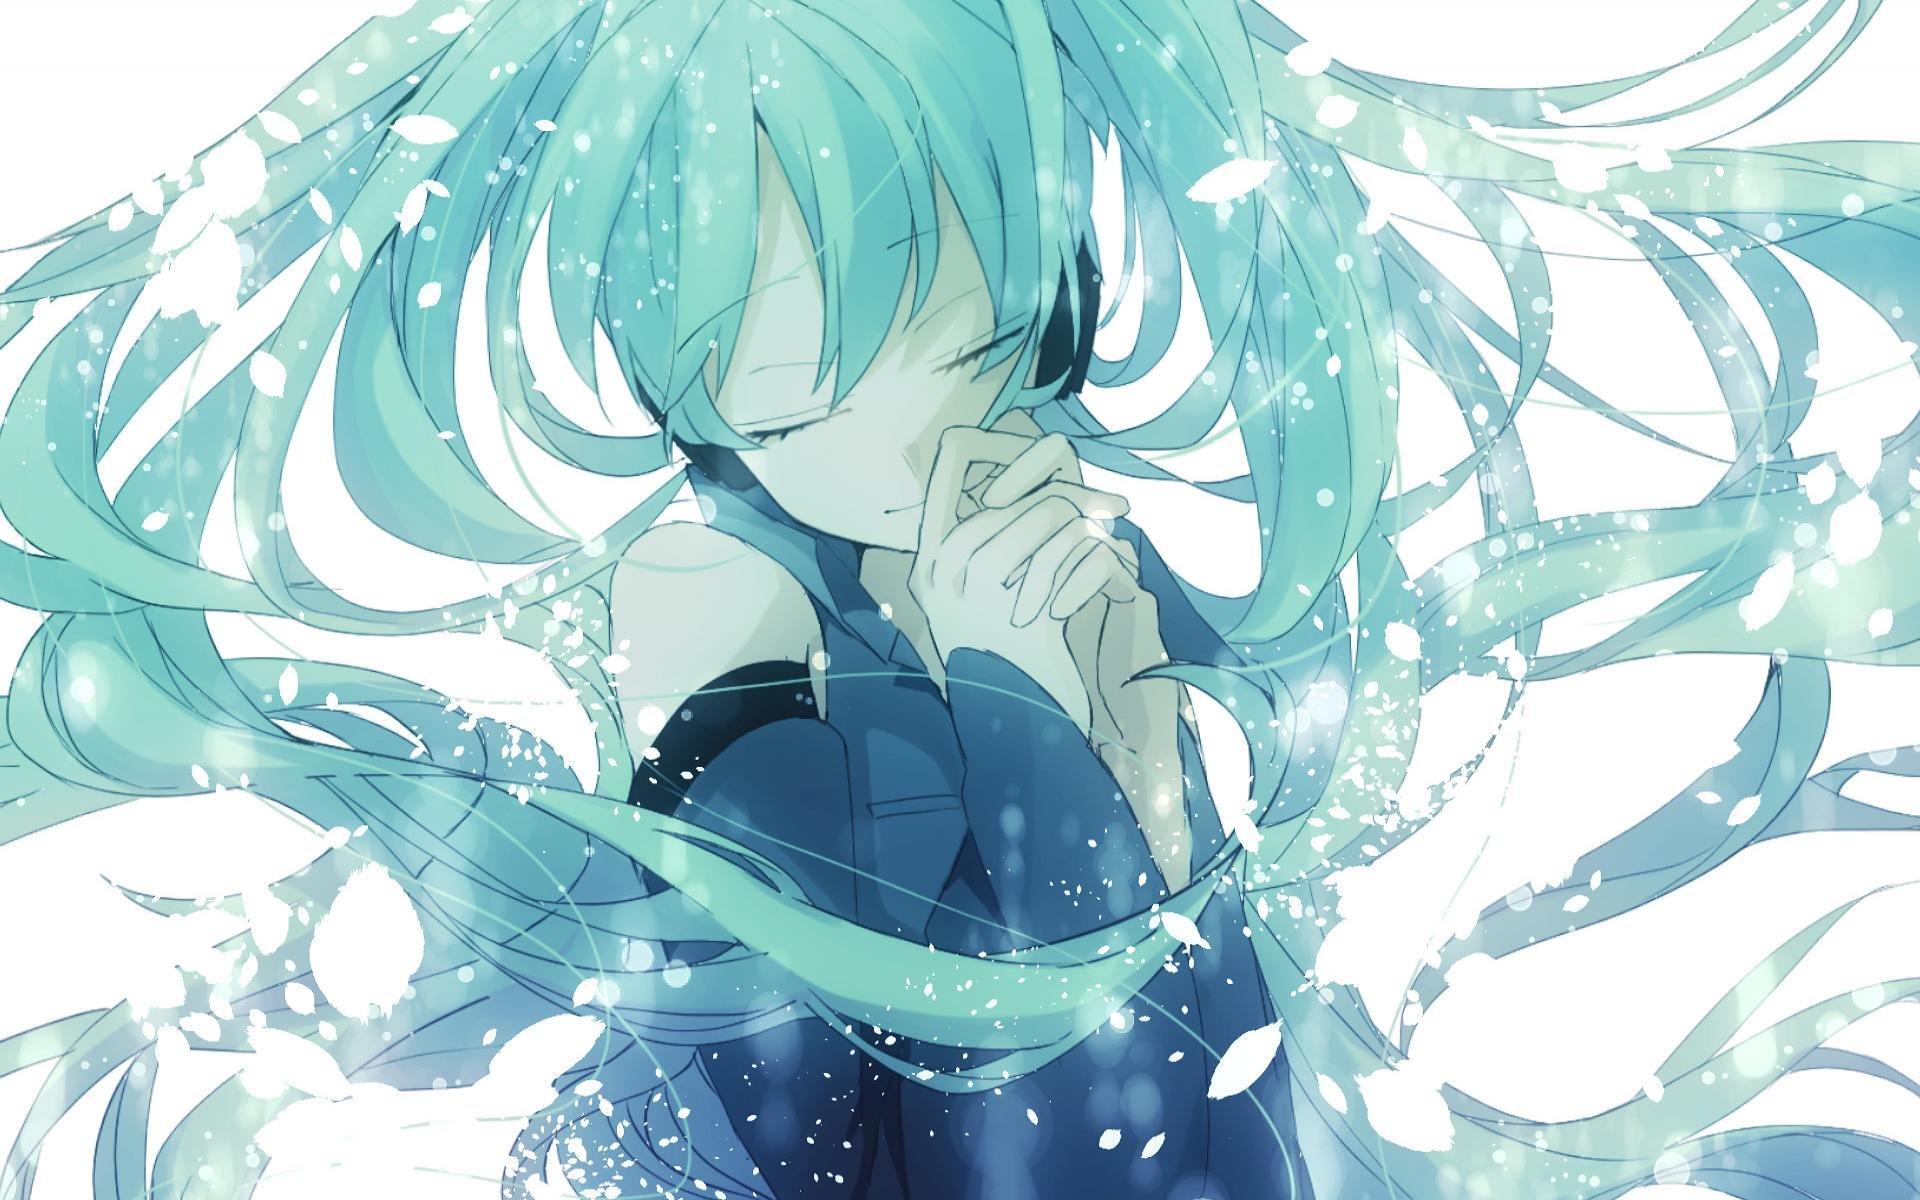 Best Hatsune Miku Wallpaper Id Hatsune Miku Anime